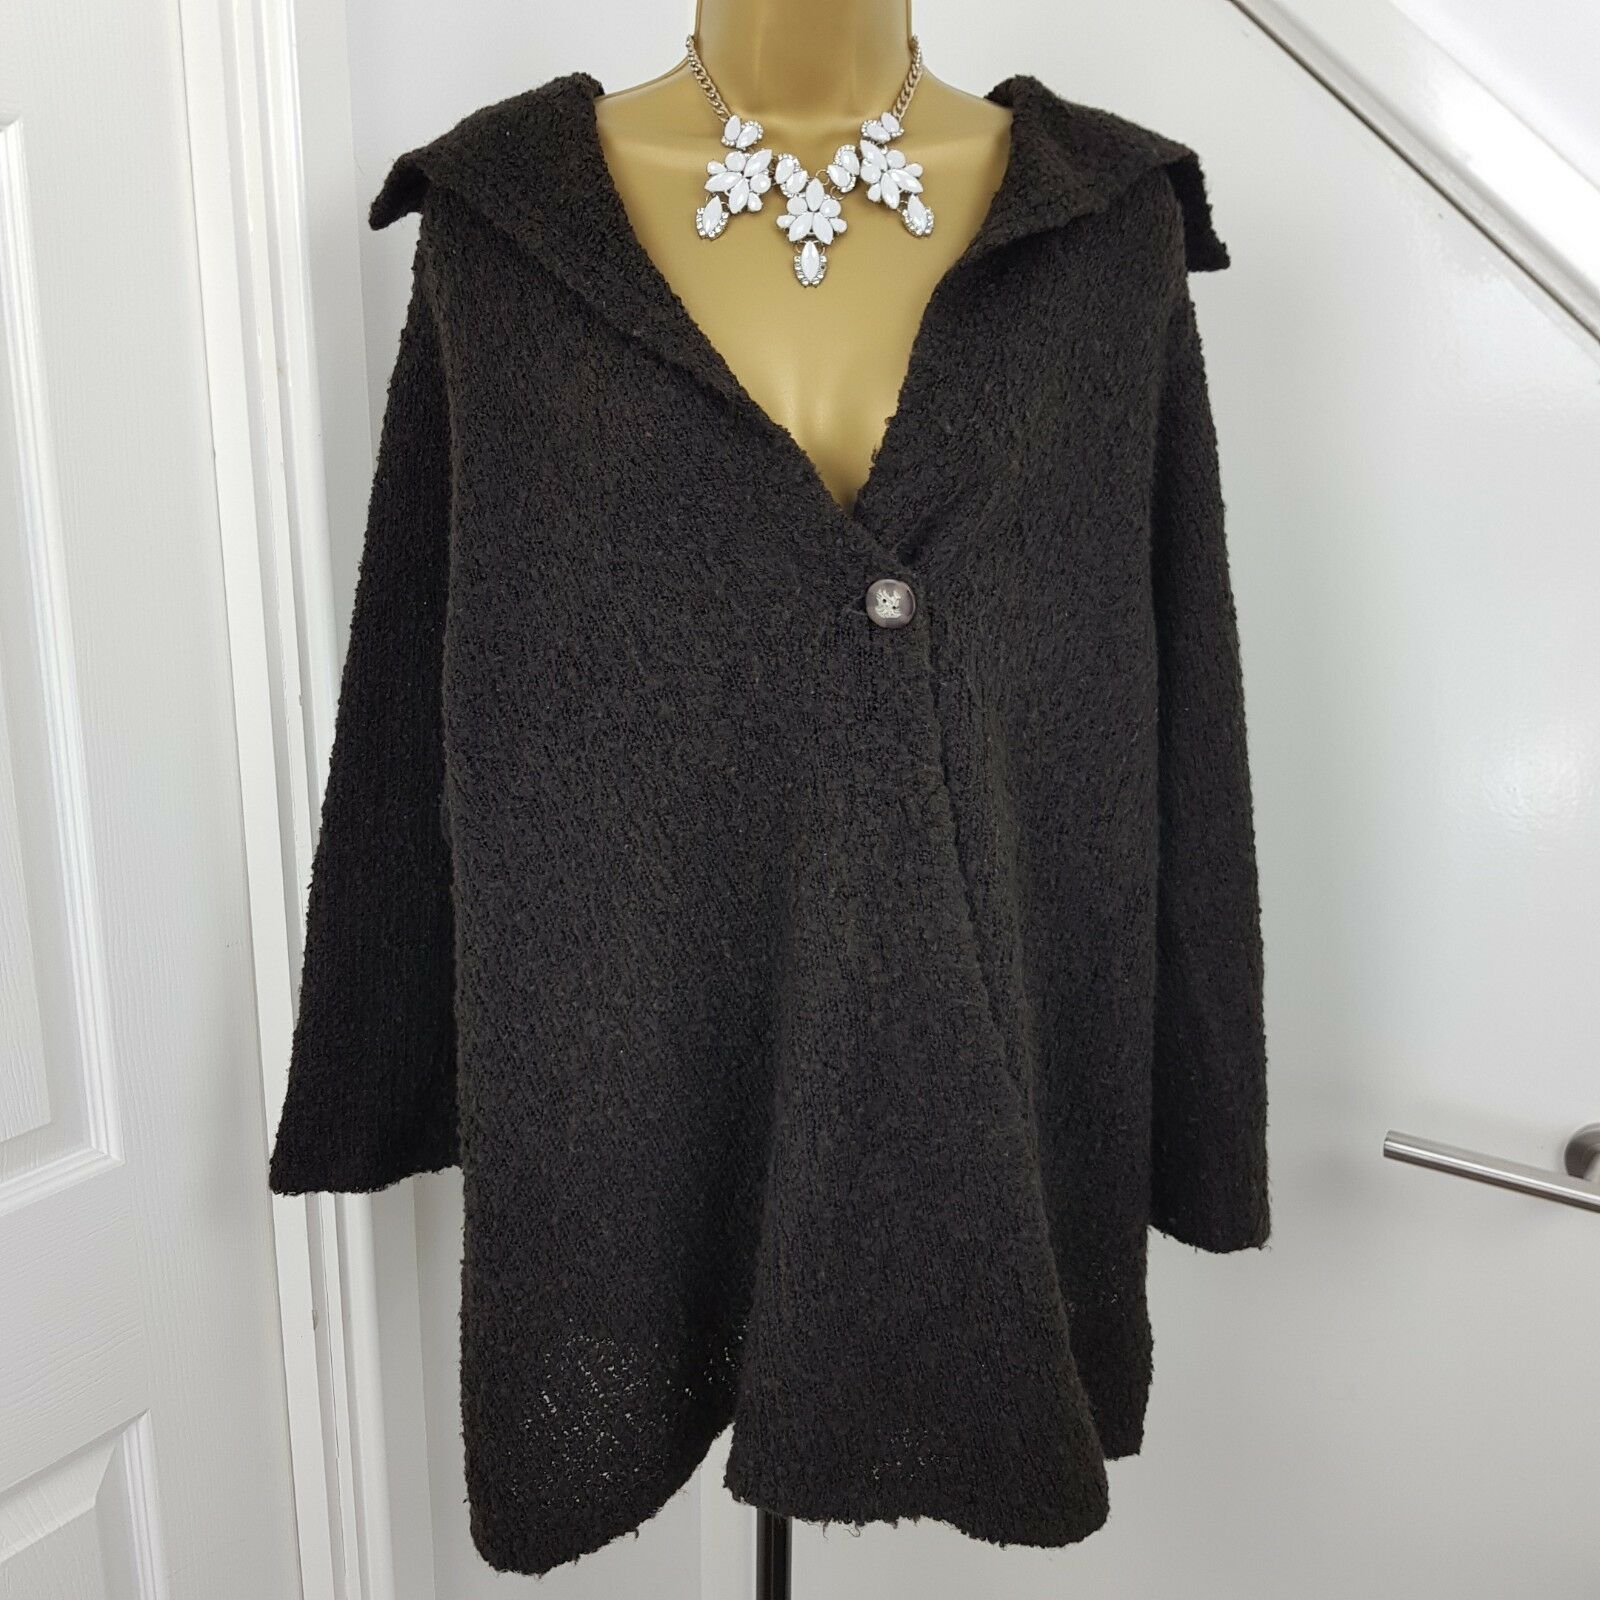 THE MASAI CLOTHING COMPANY Cardigan Midi Jumper Wool Blen Lagenlook Knit Brown M